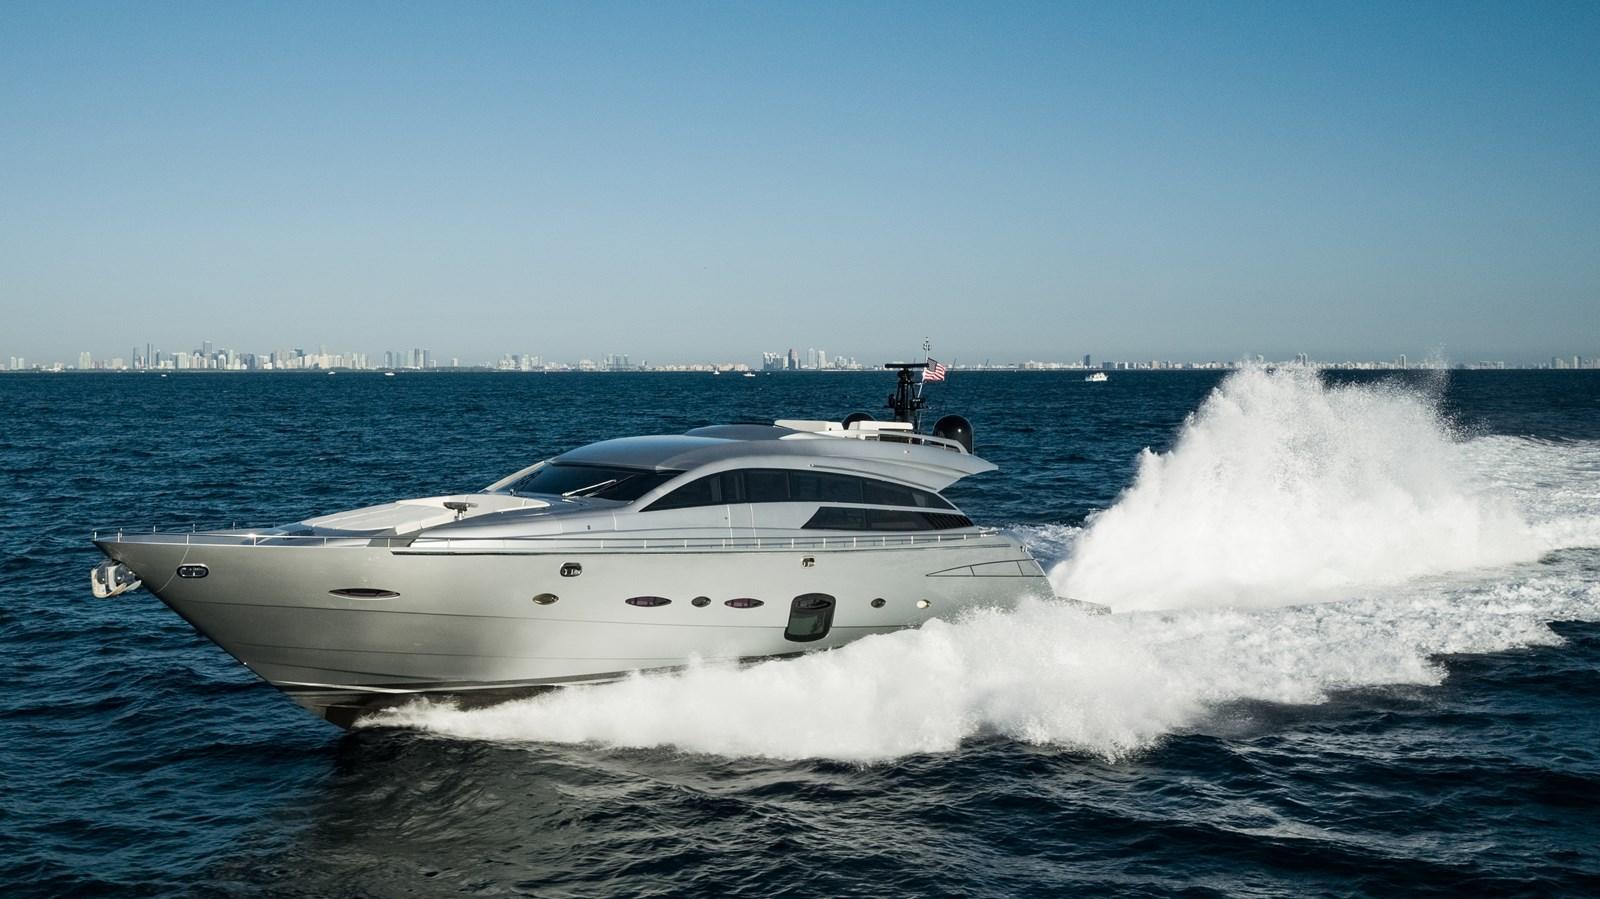 DJI_0008 2012 PERSHING  Motor Yacht 2810218